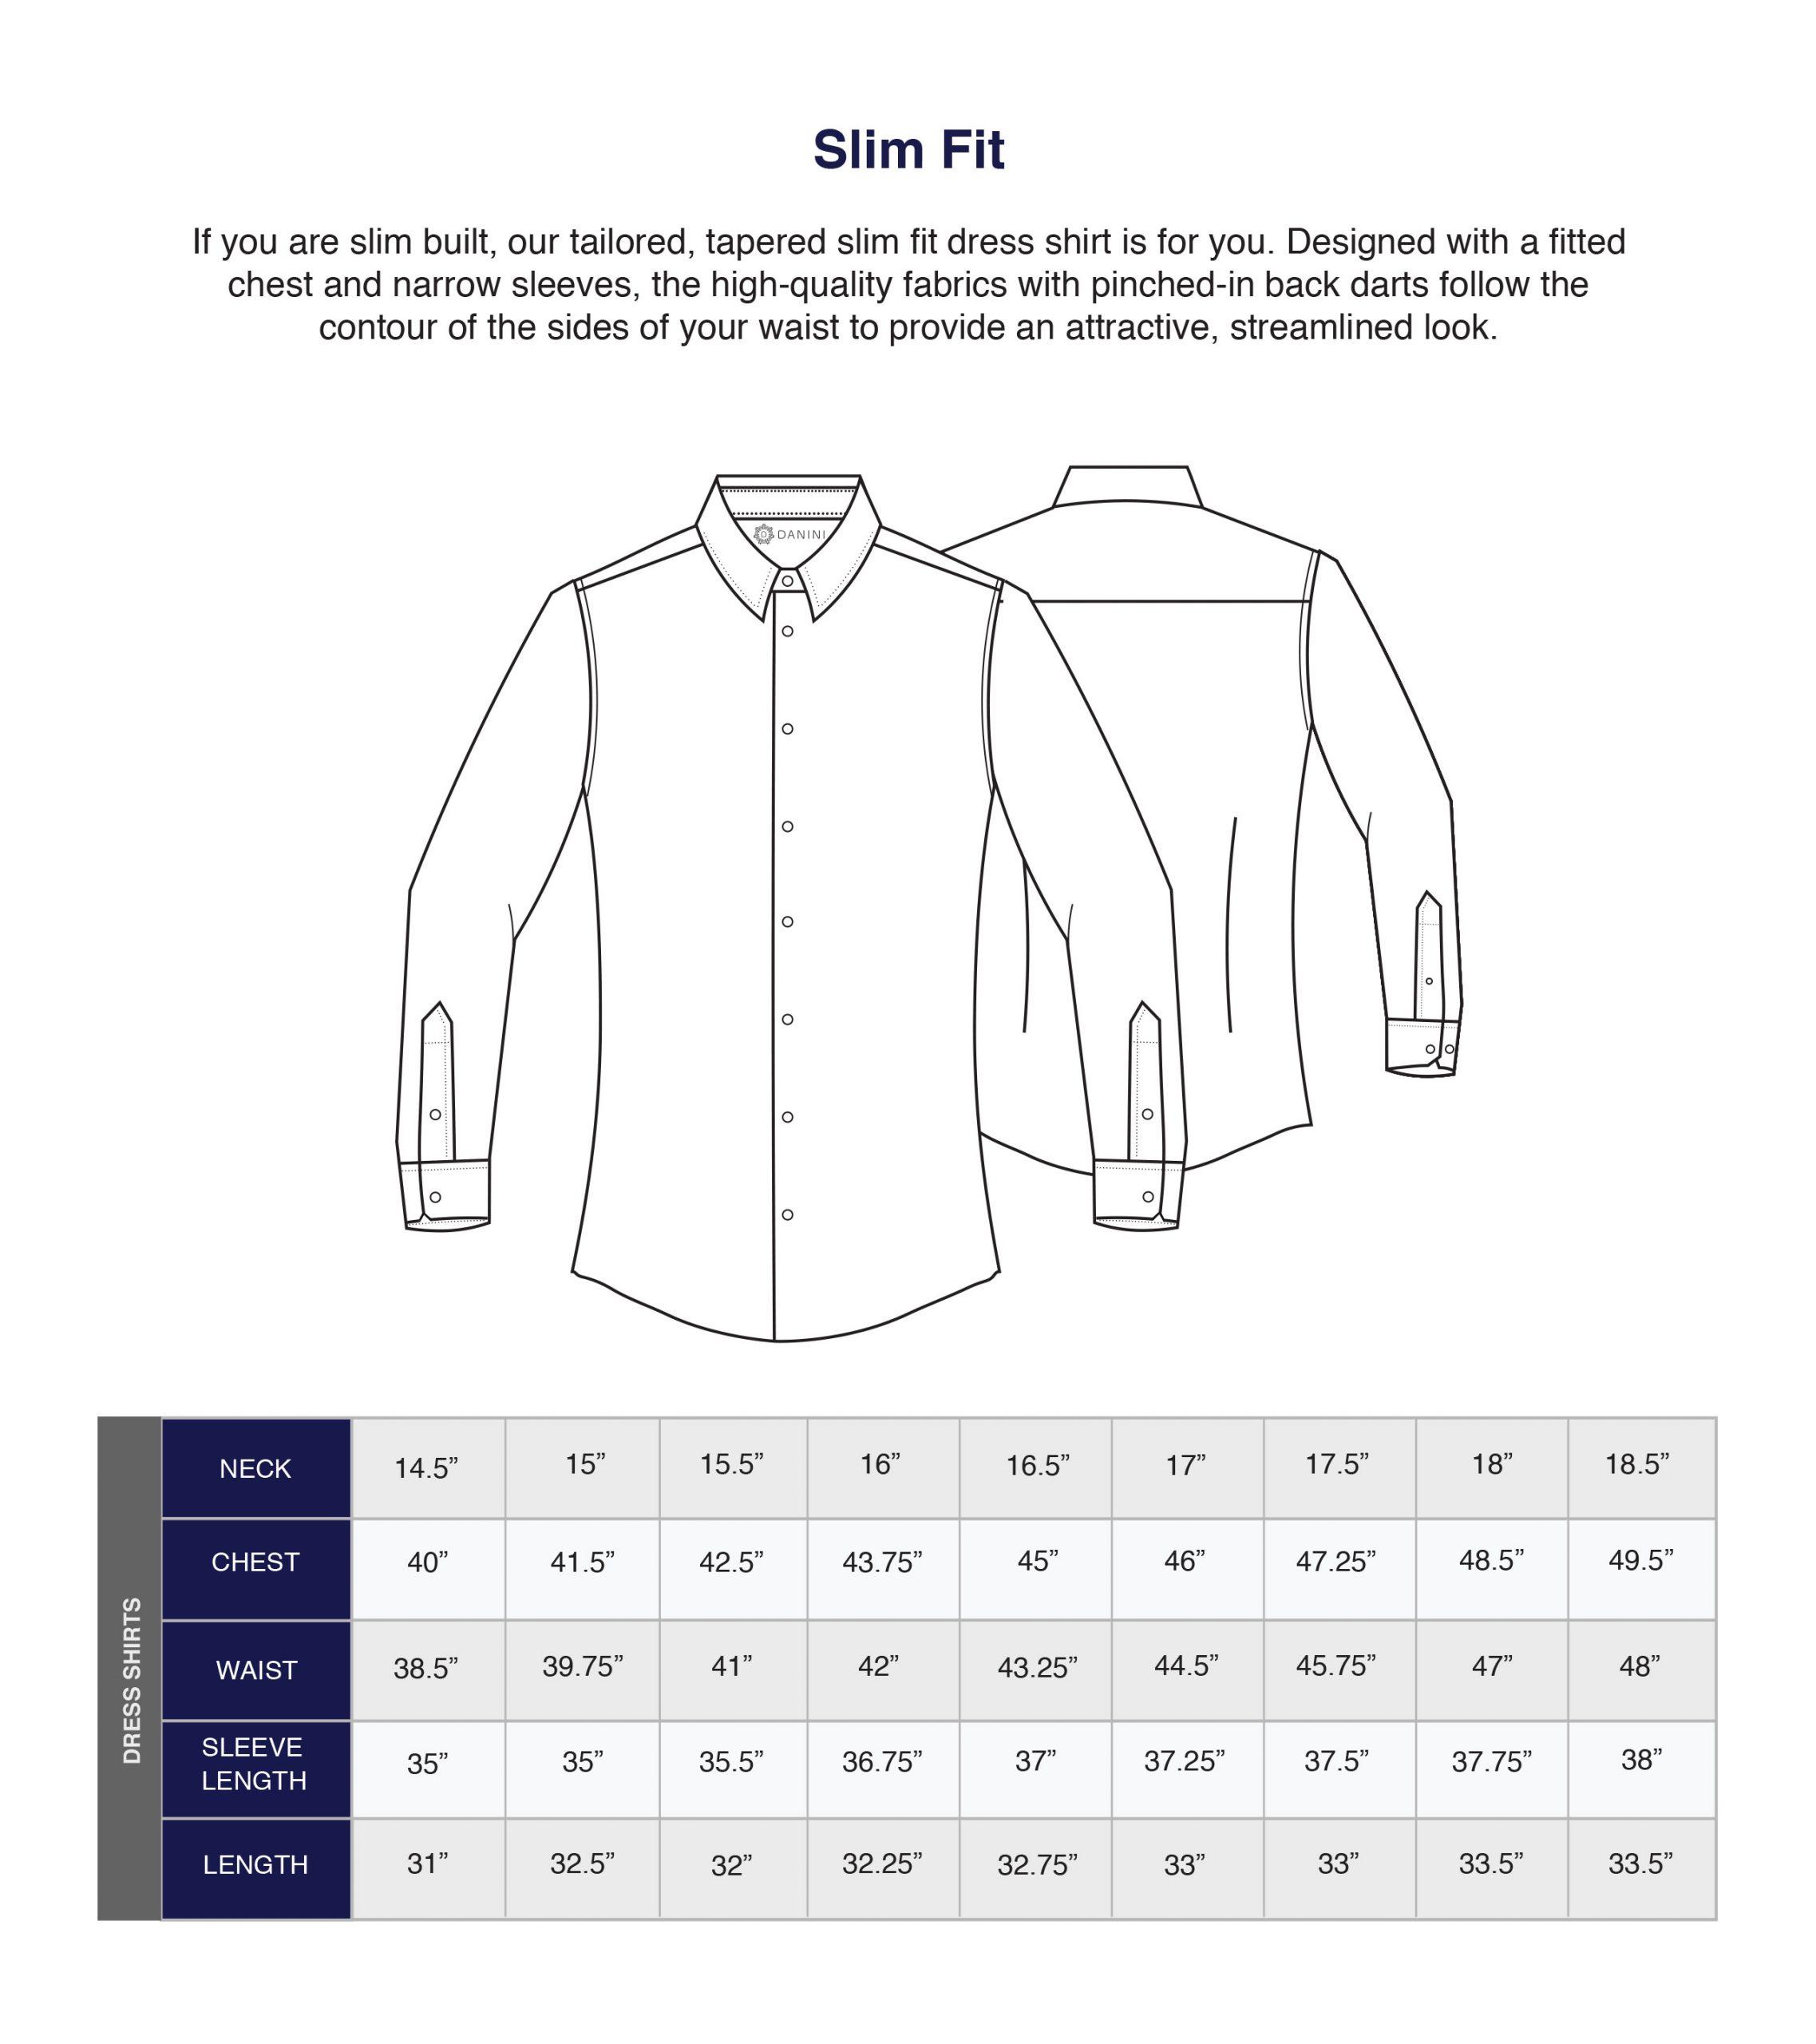 Danini Size Guide Shirts